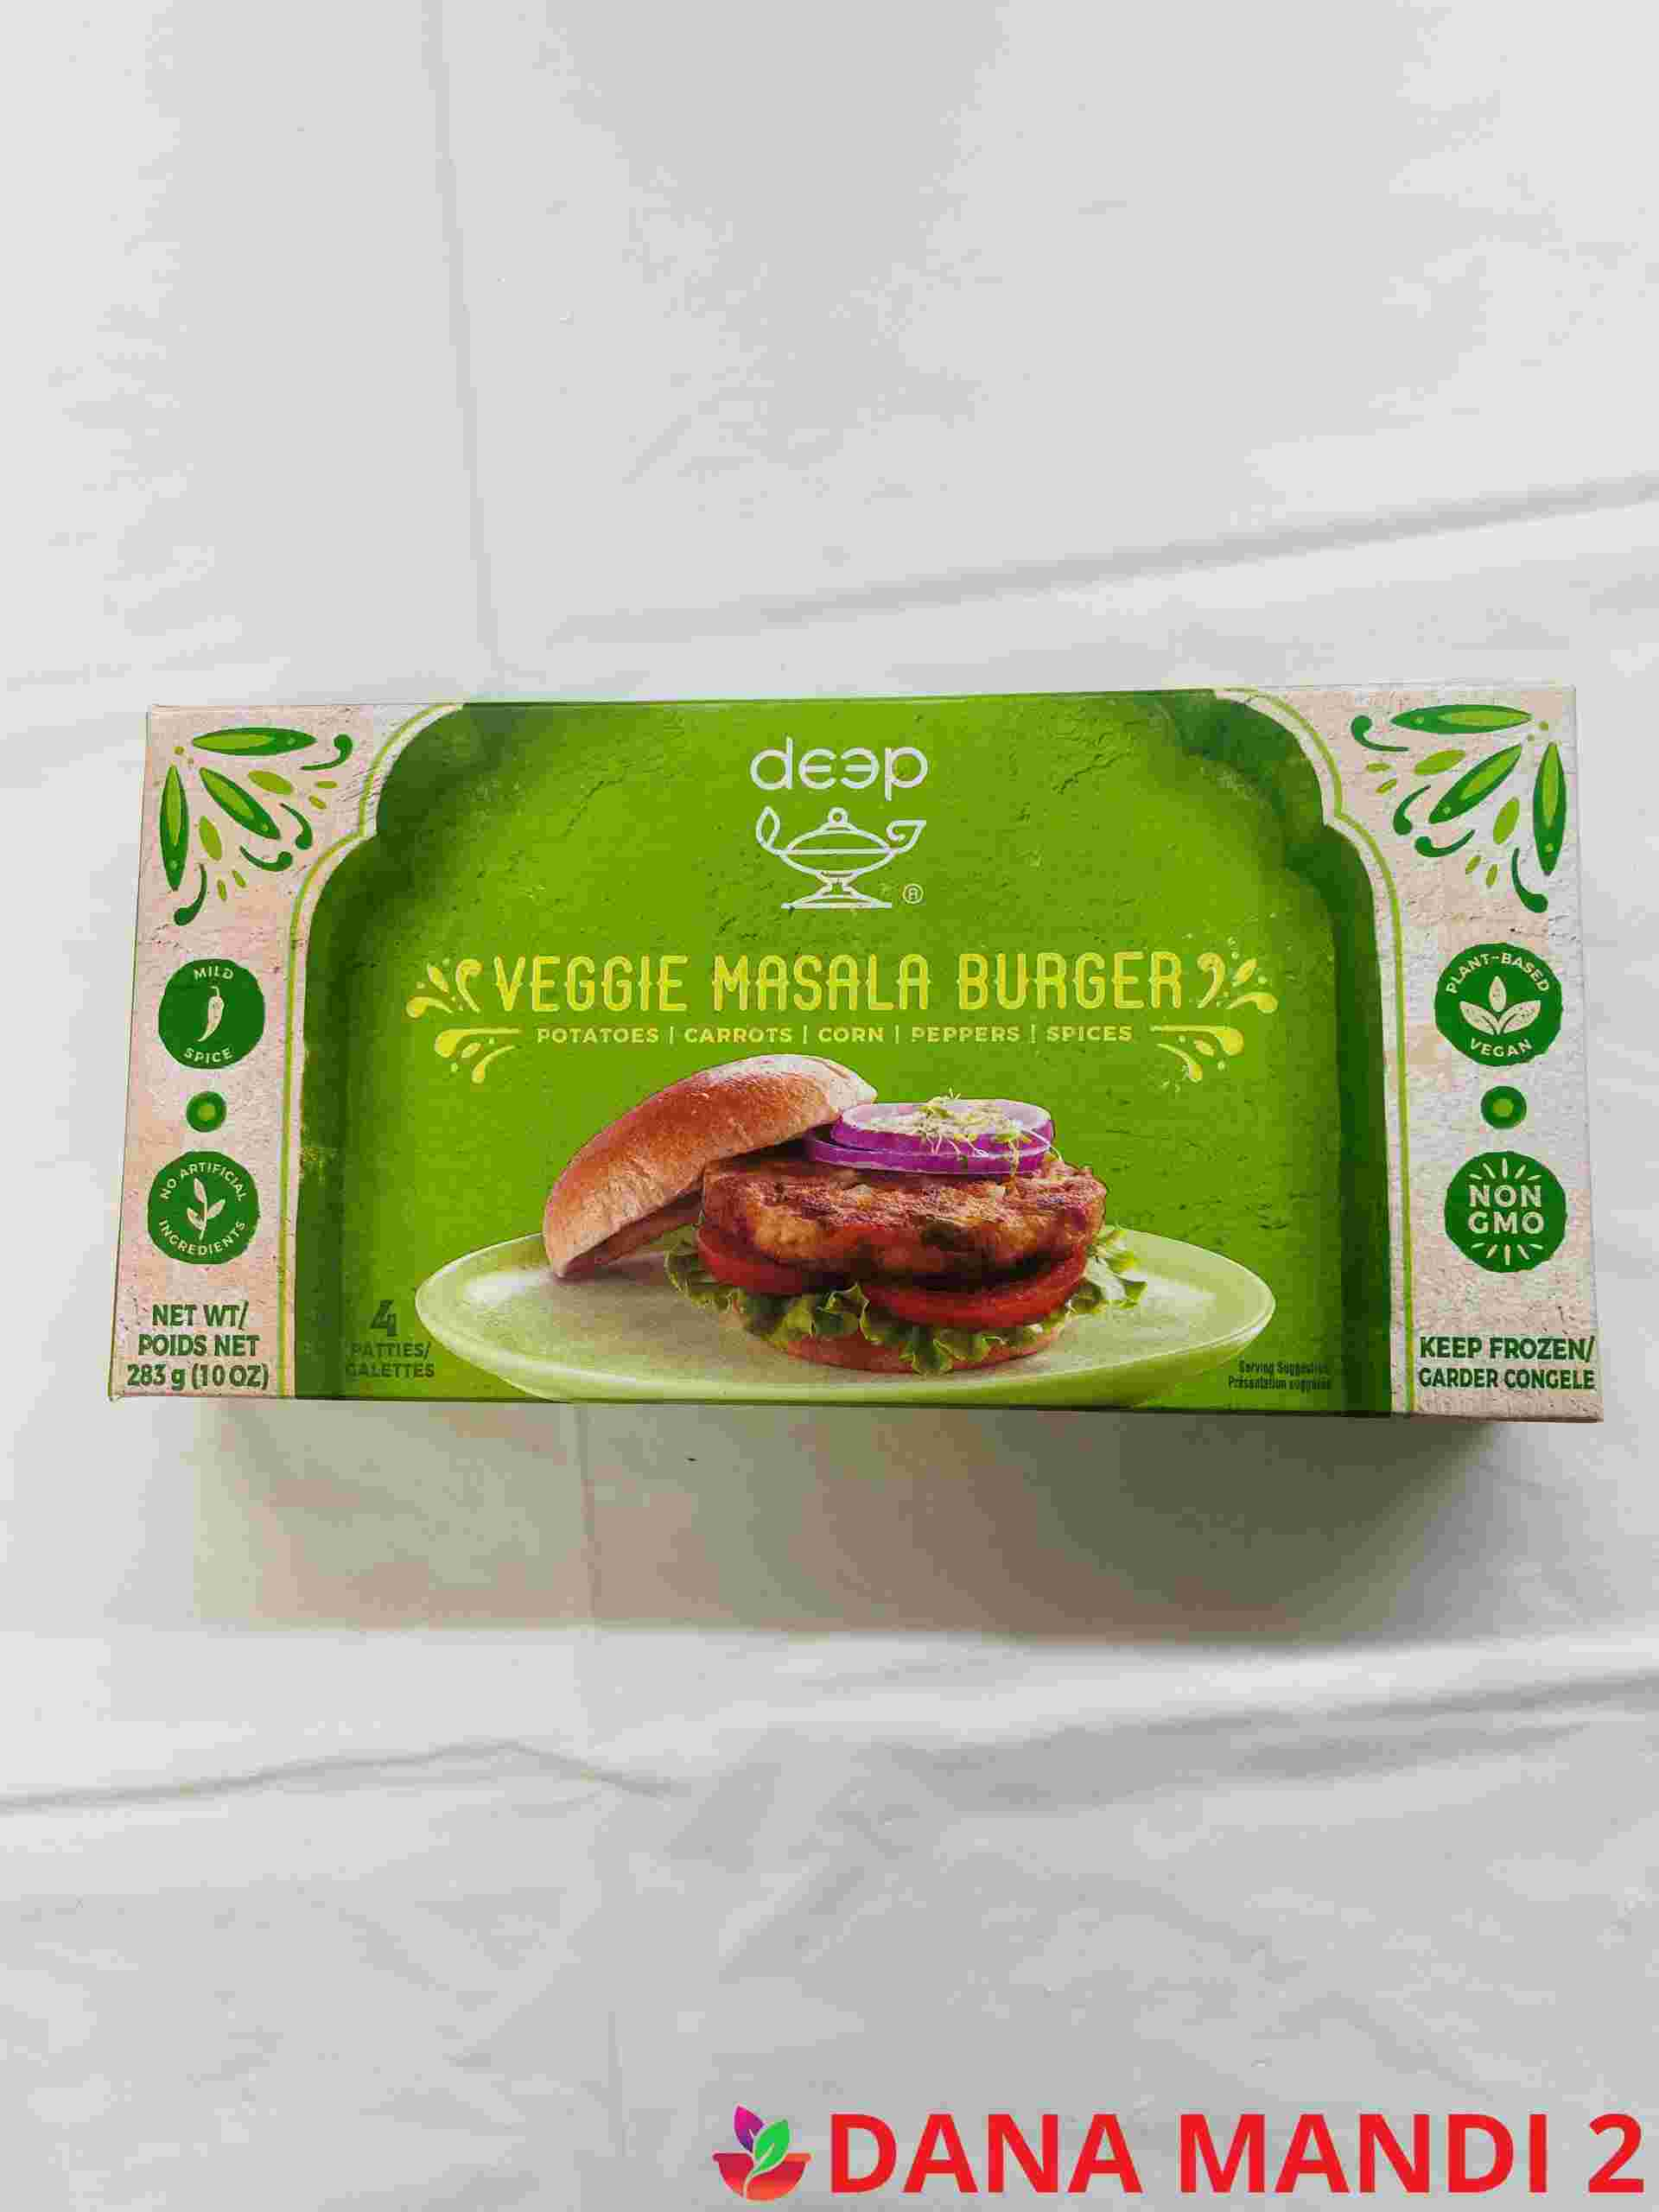 Deep Veggie Masala Burger 4 Pieces